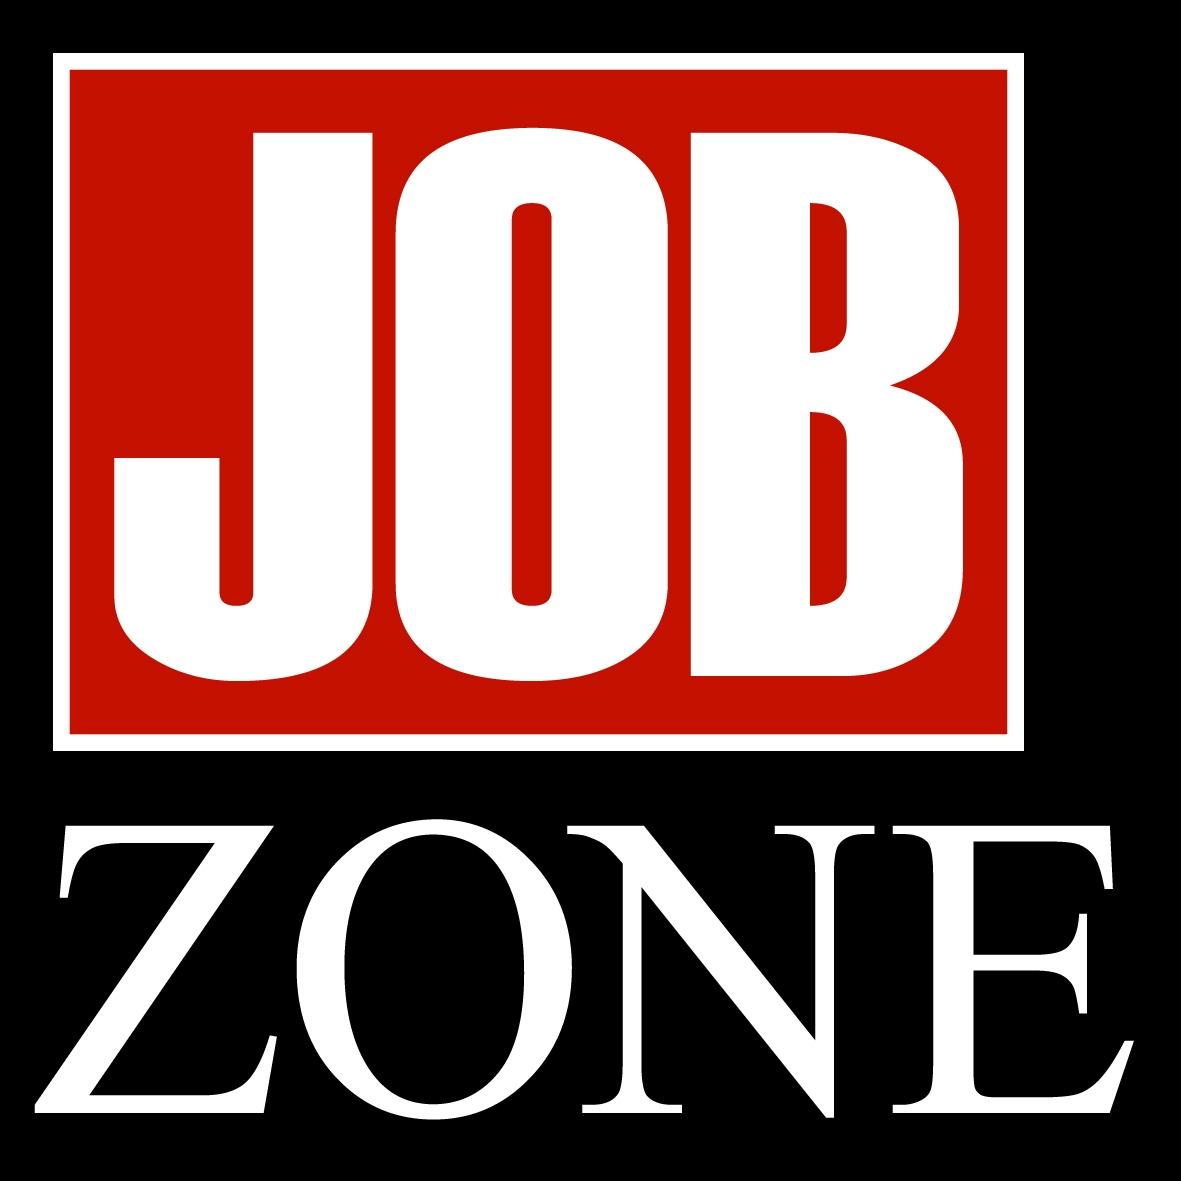 Jobzone logo